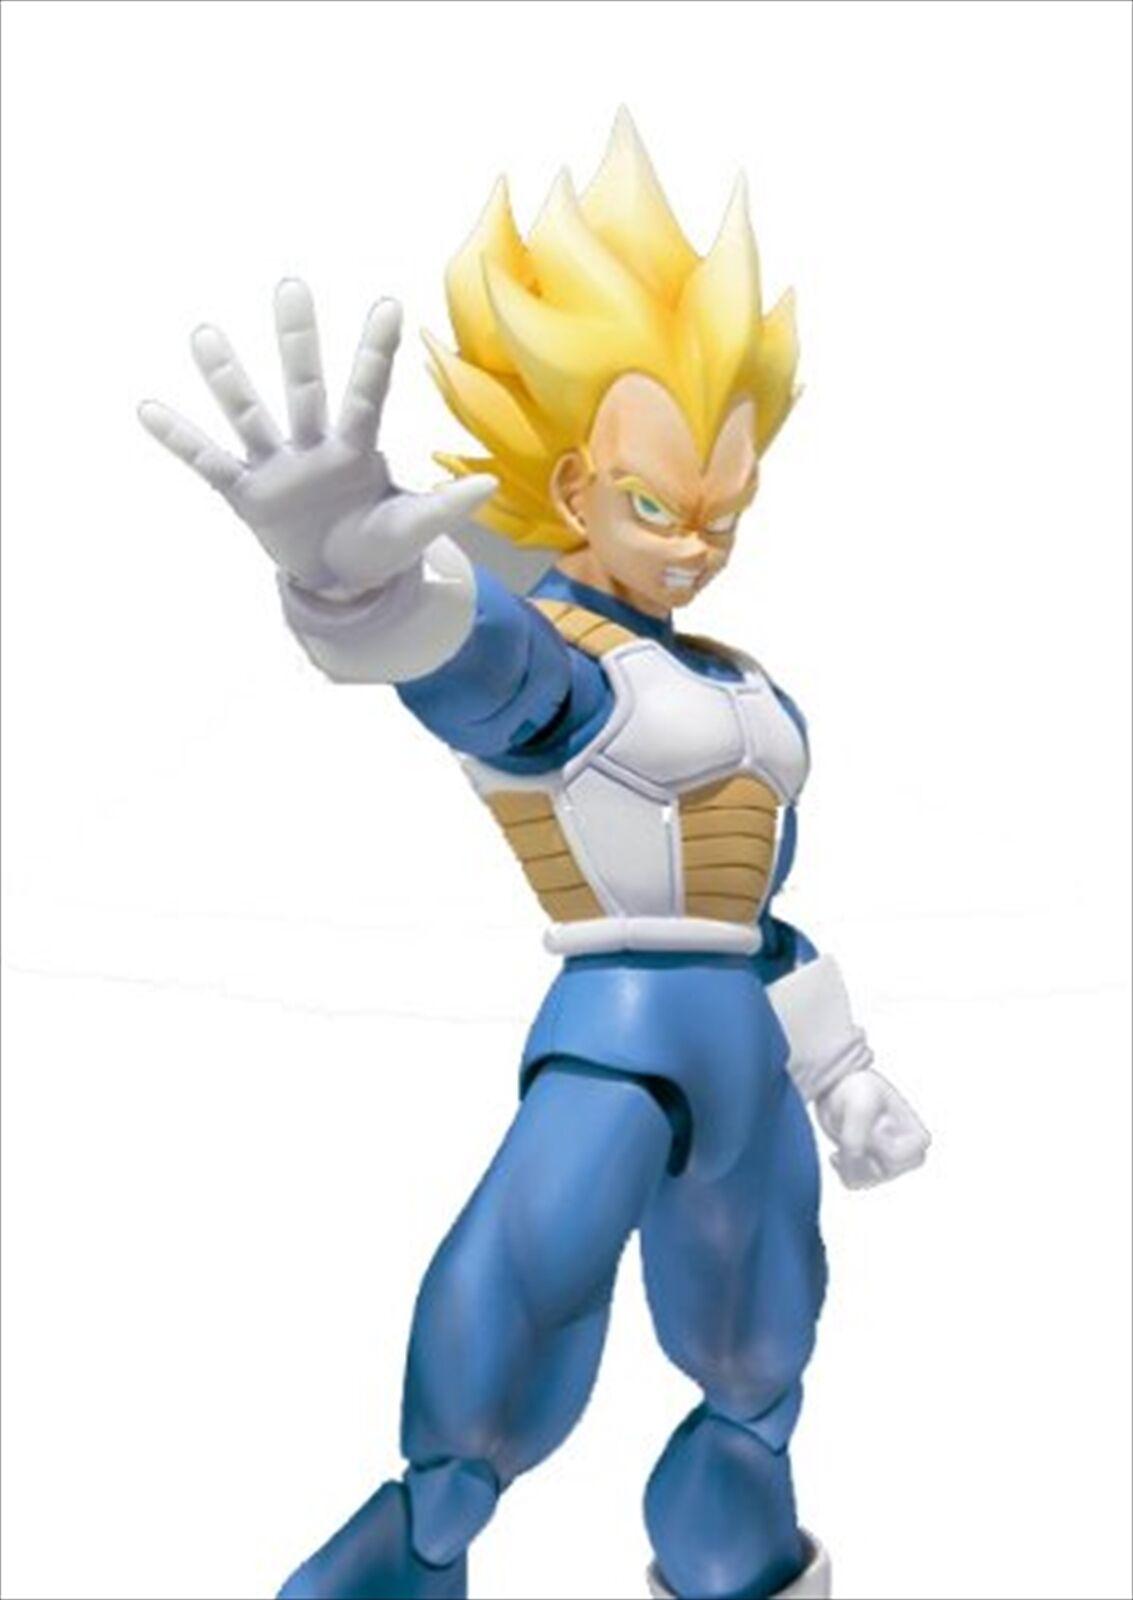 Bandai S.H. Figuarts Super Saiyan Vegeta Action Figure